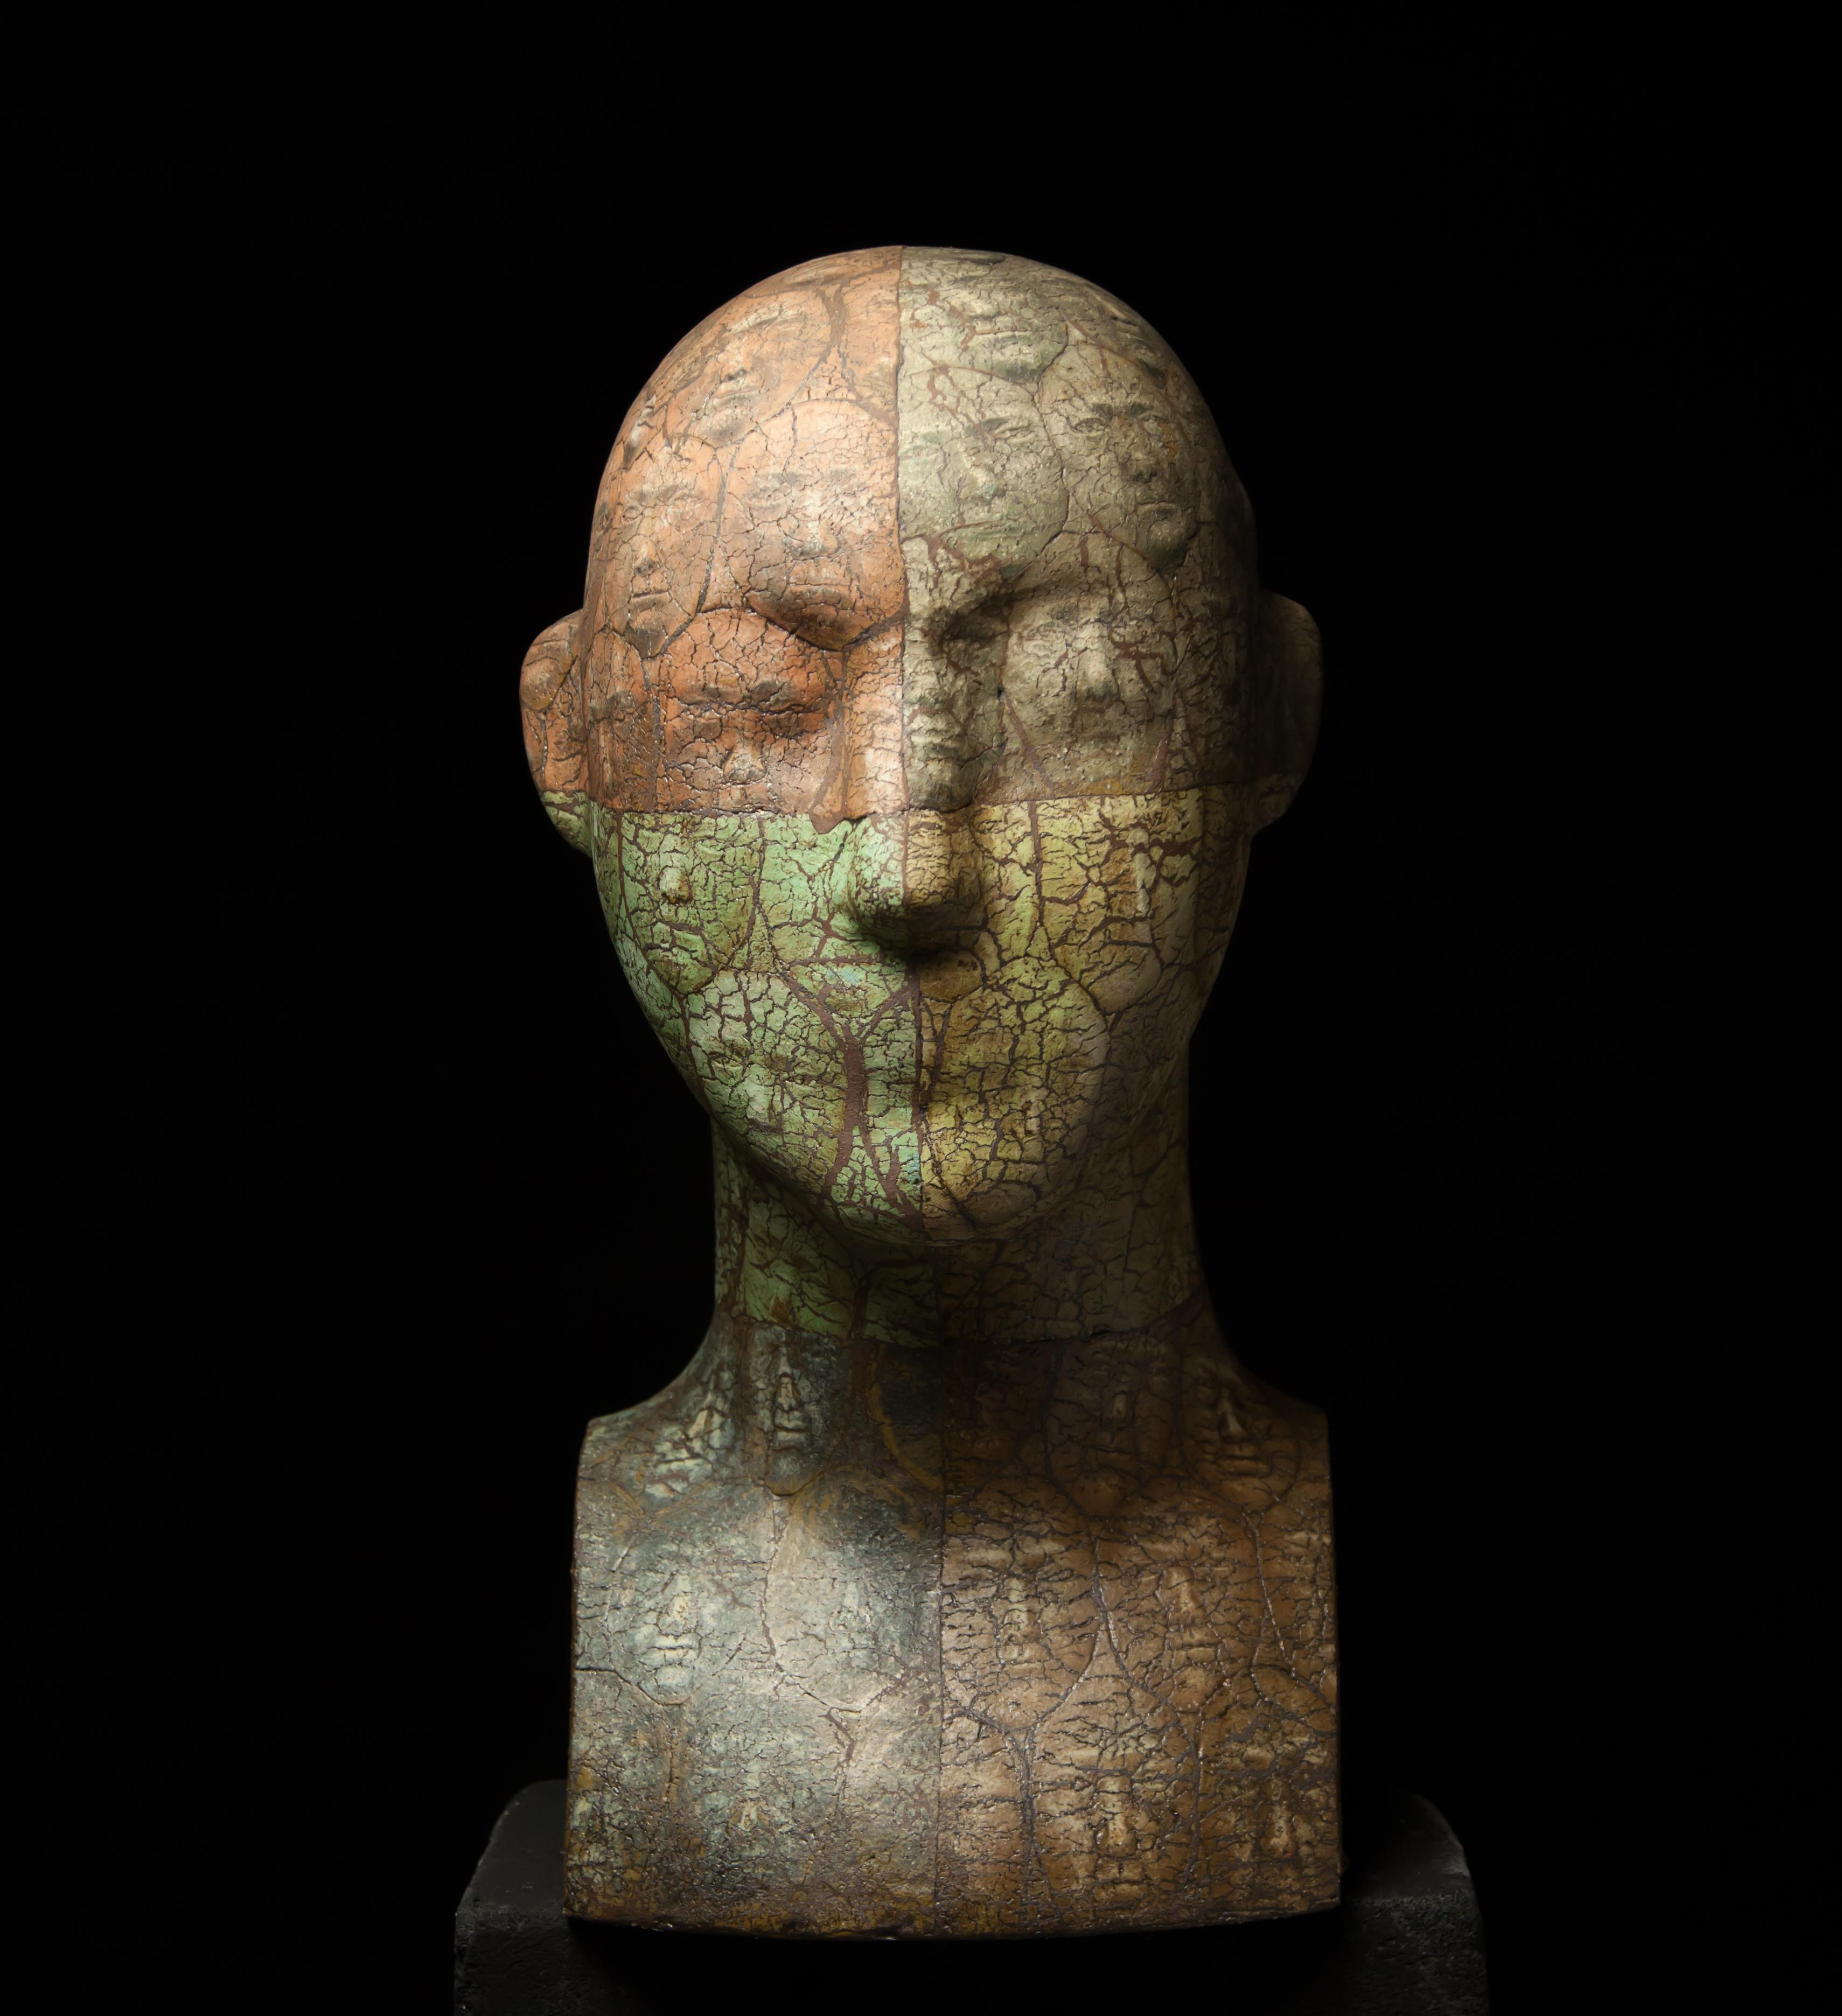 """Crowd"" Ceramic Sculpture Ed. 1/1 24"" x 12"" x 12"" in by Oleksandr Miroshnychenko"